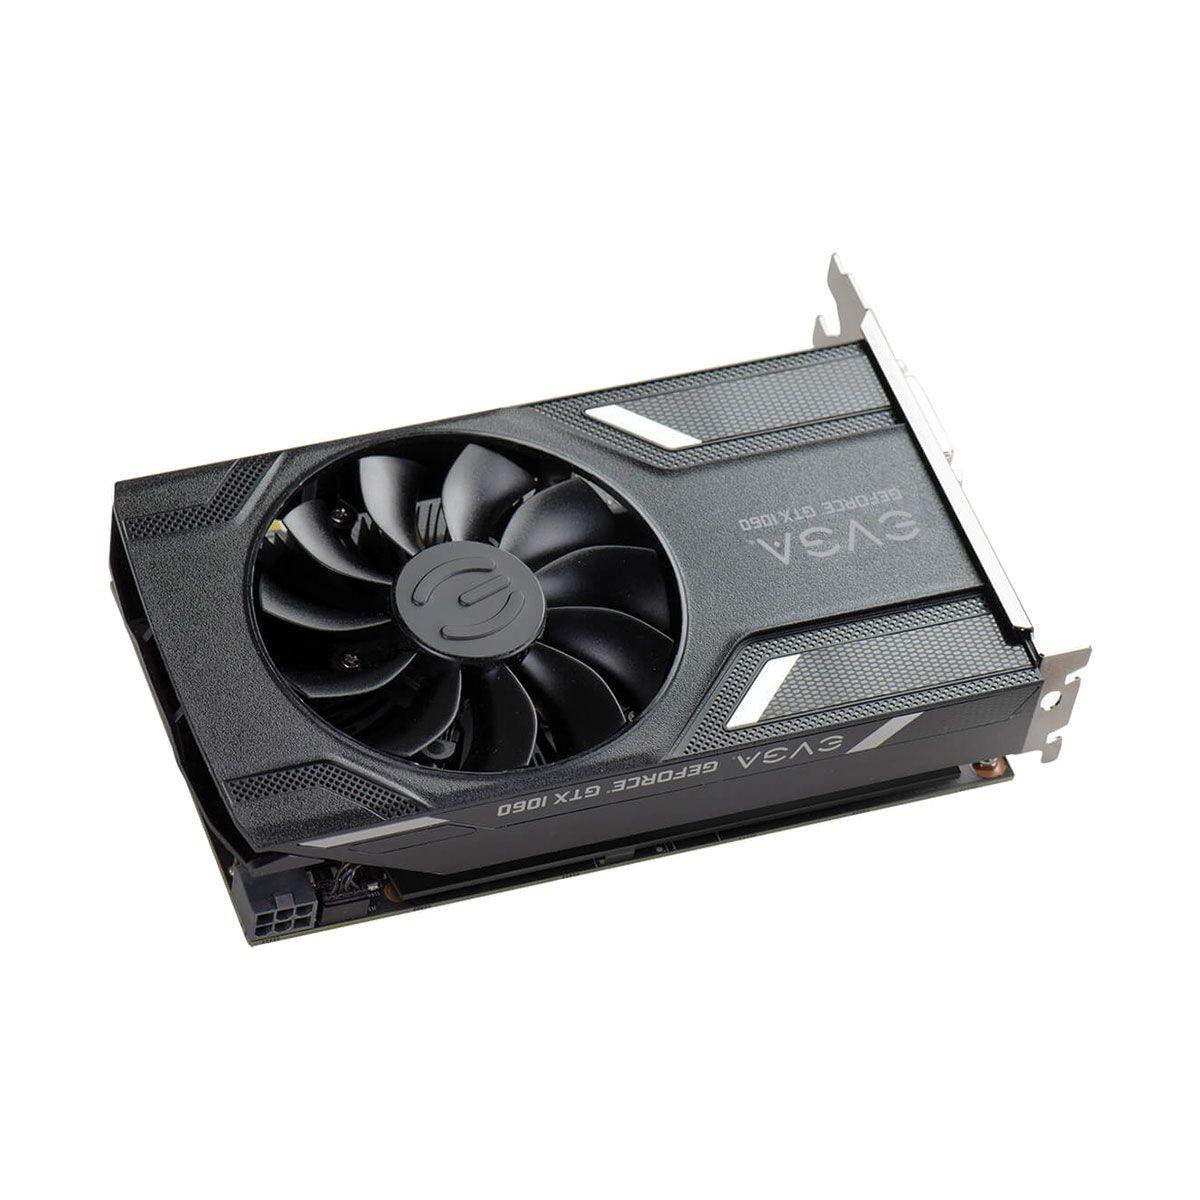 Placa de Video Nvidia Geforce GTX 1060 Gaming 3GB GDDR5 192 BITS (single fan) 03G-P4-6160-KR - EVGA